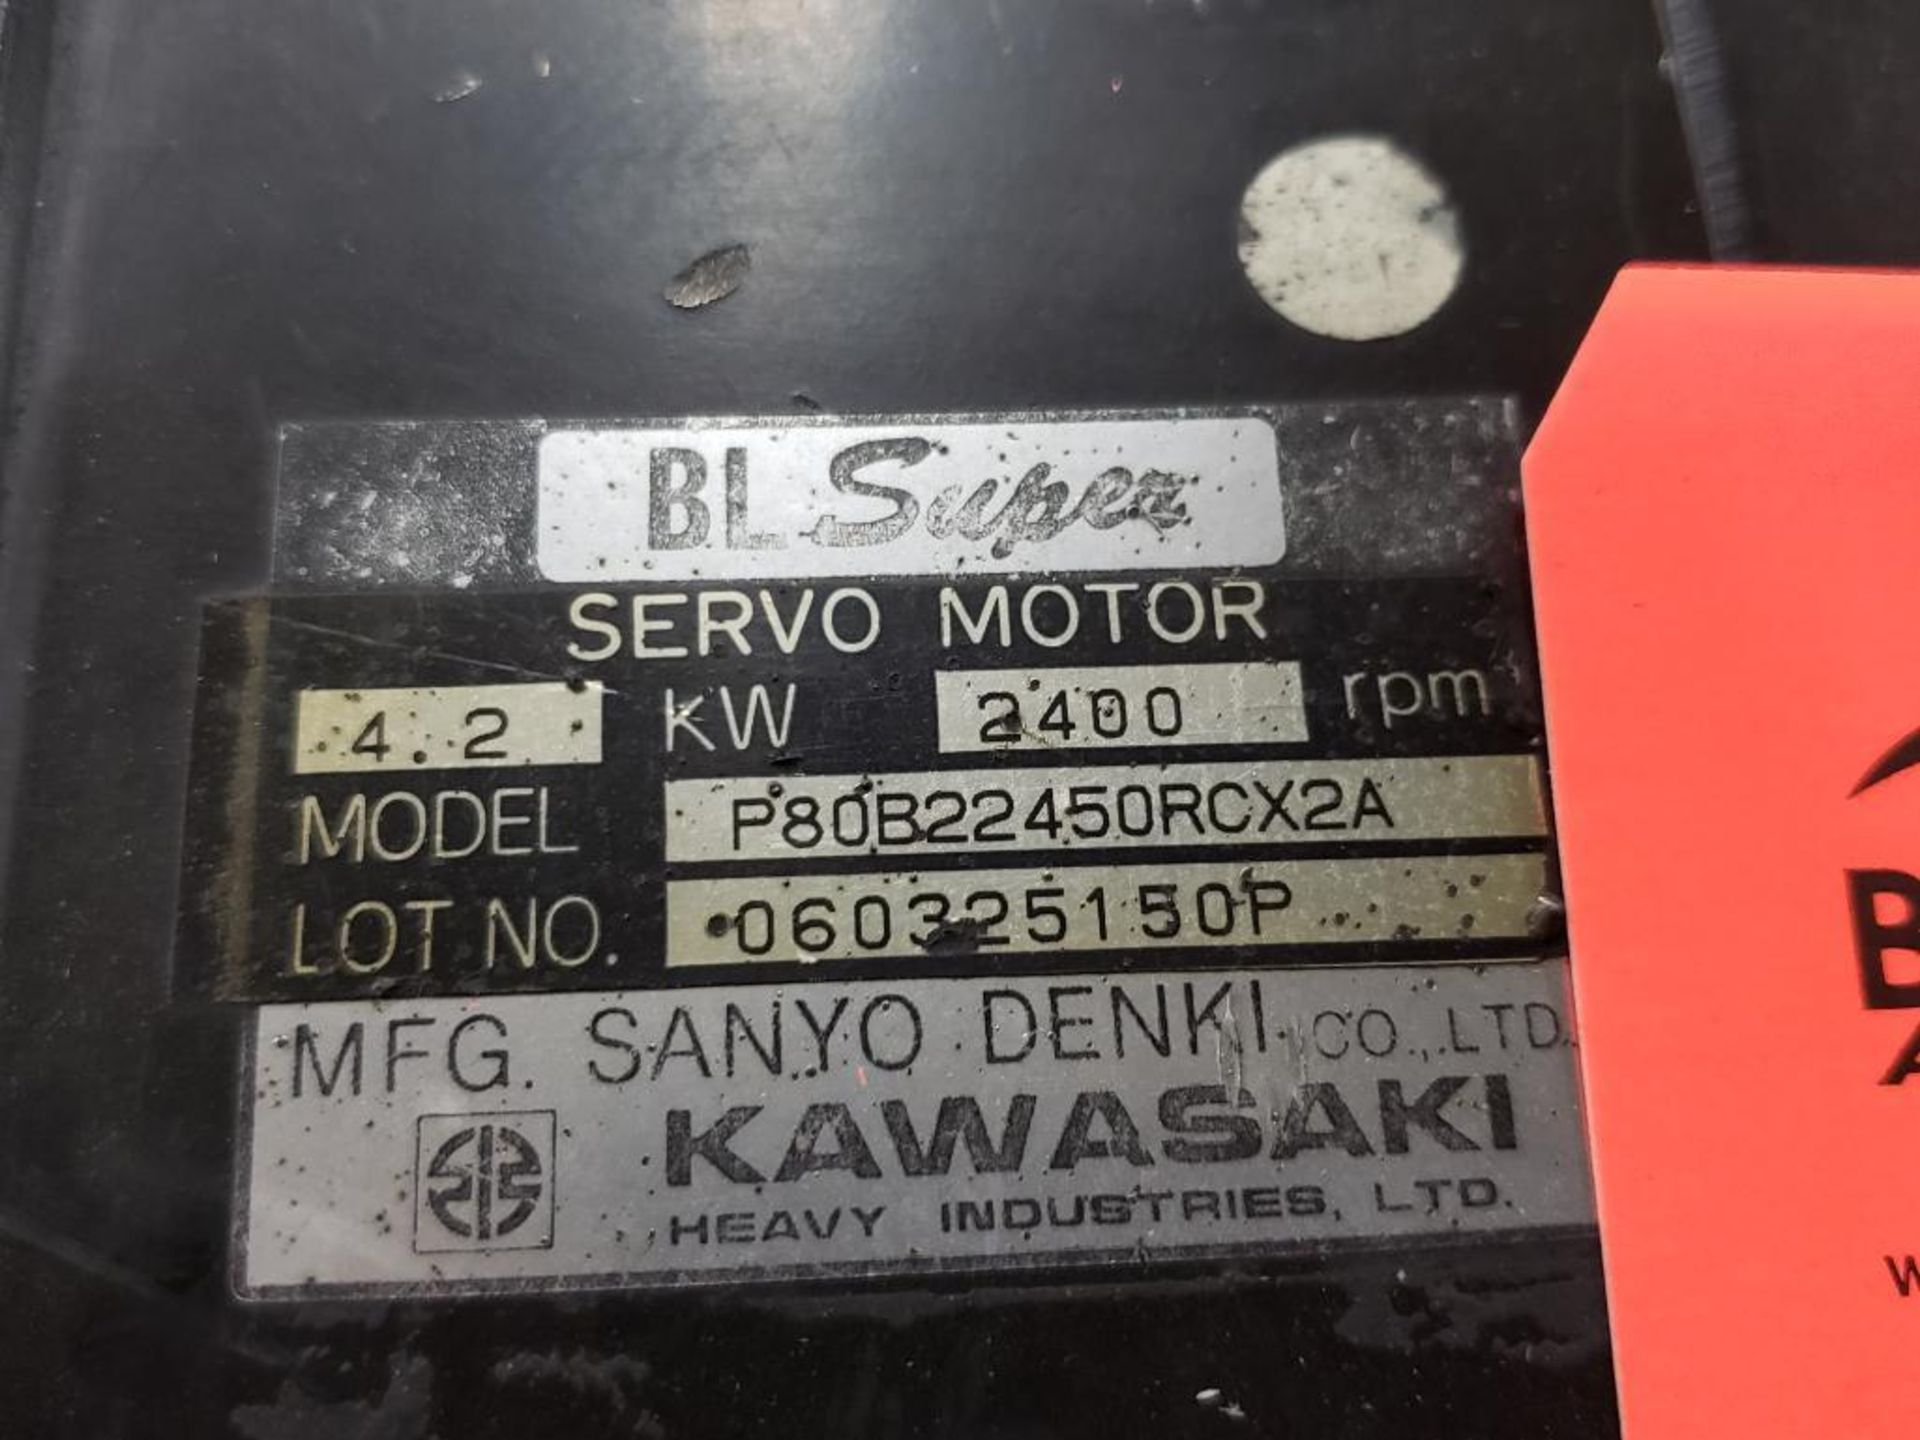 4.2kW Kawasaki Servo Motor P80B22450RCX2A. 2400RPM. - Image 3 of 3